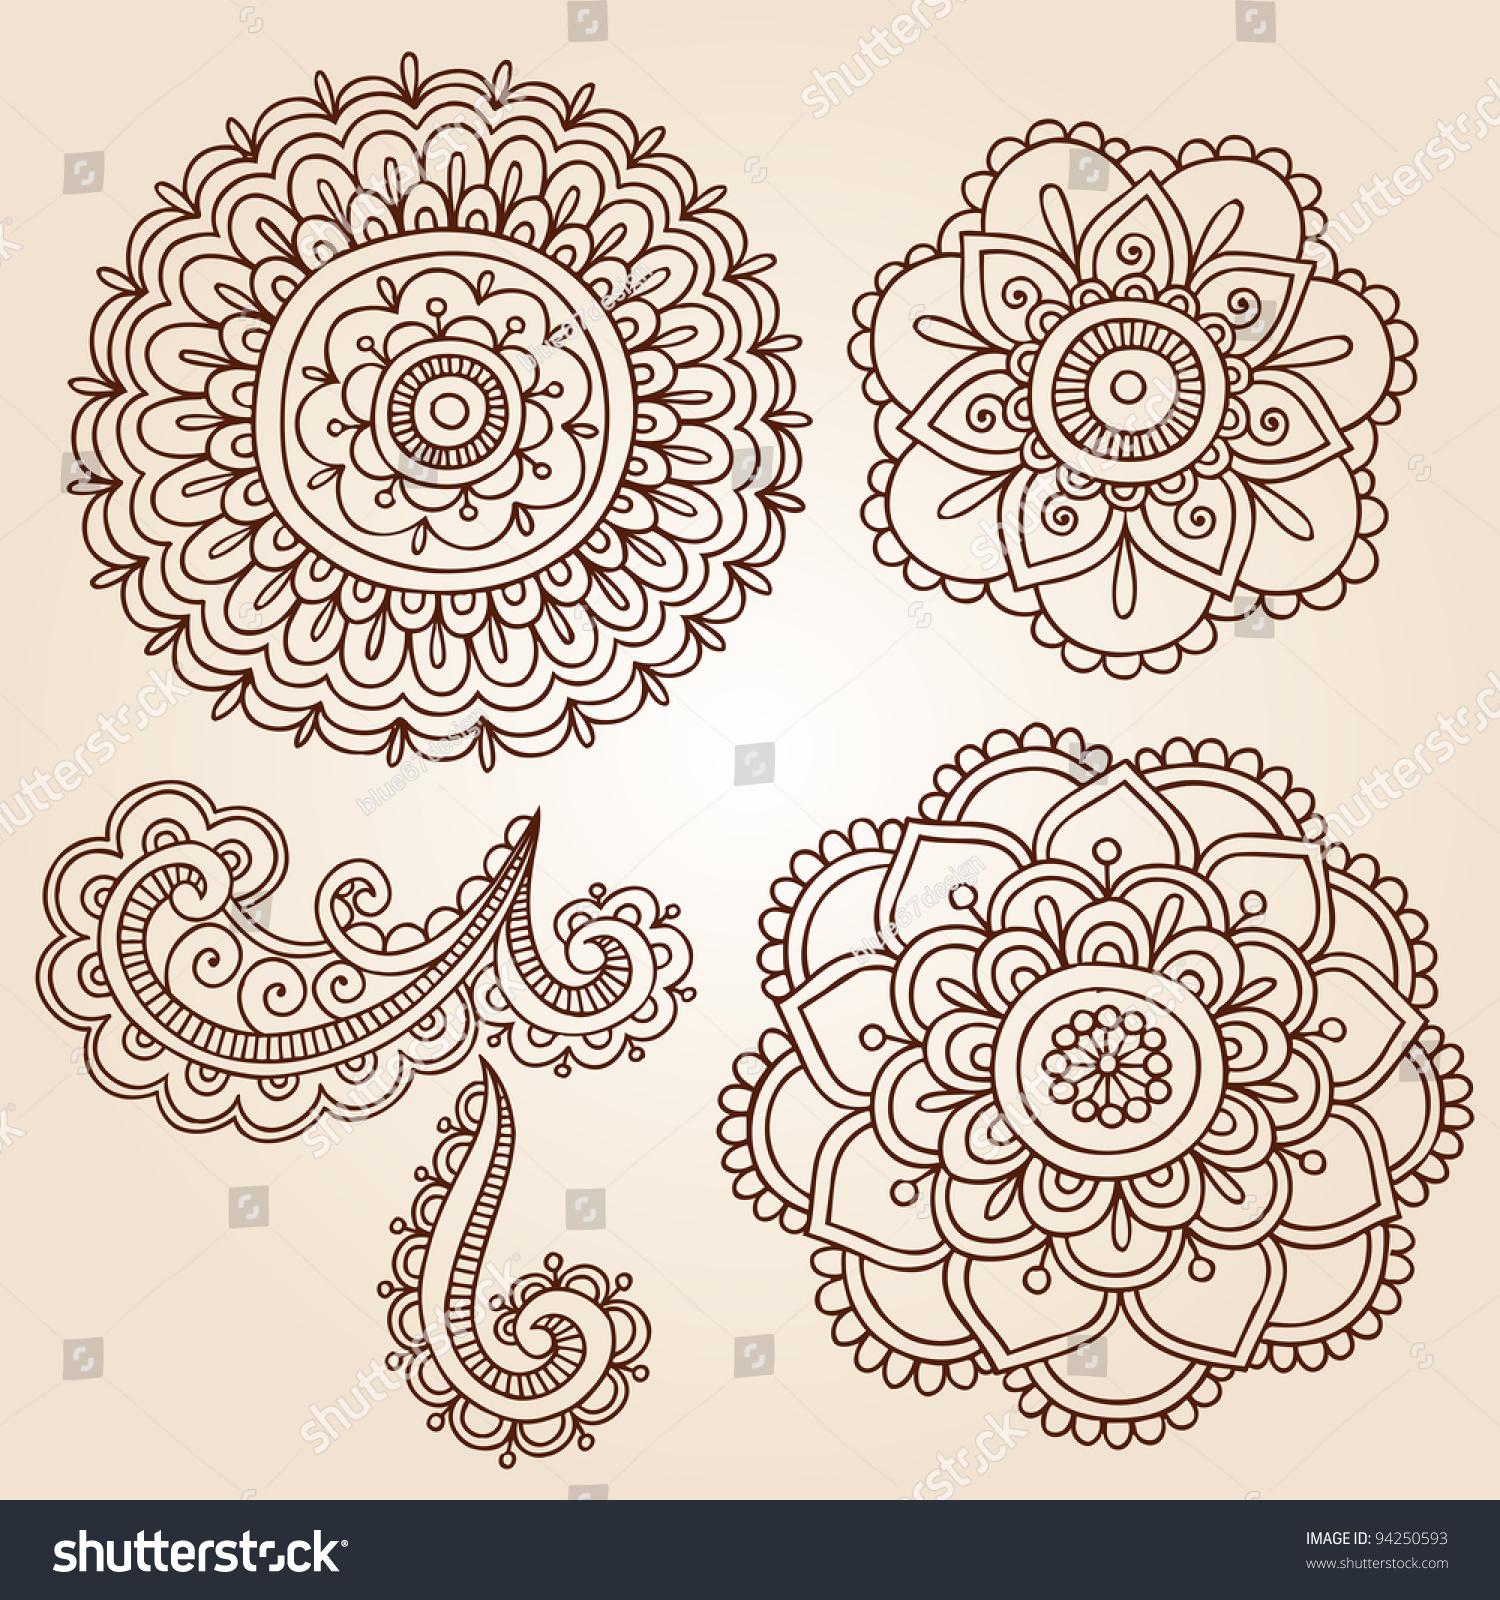 Mehndi Flower Chadar : Mehndi flower pixshark images galleries with a